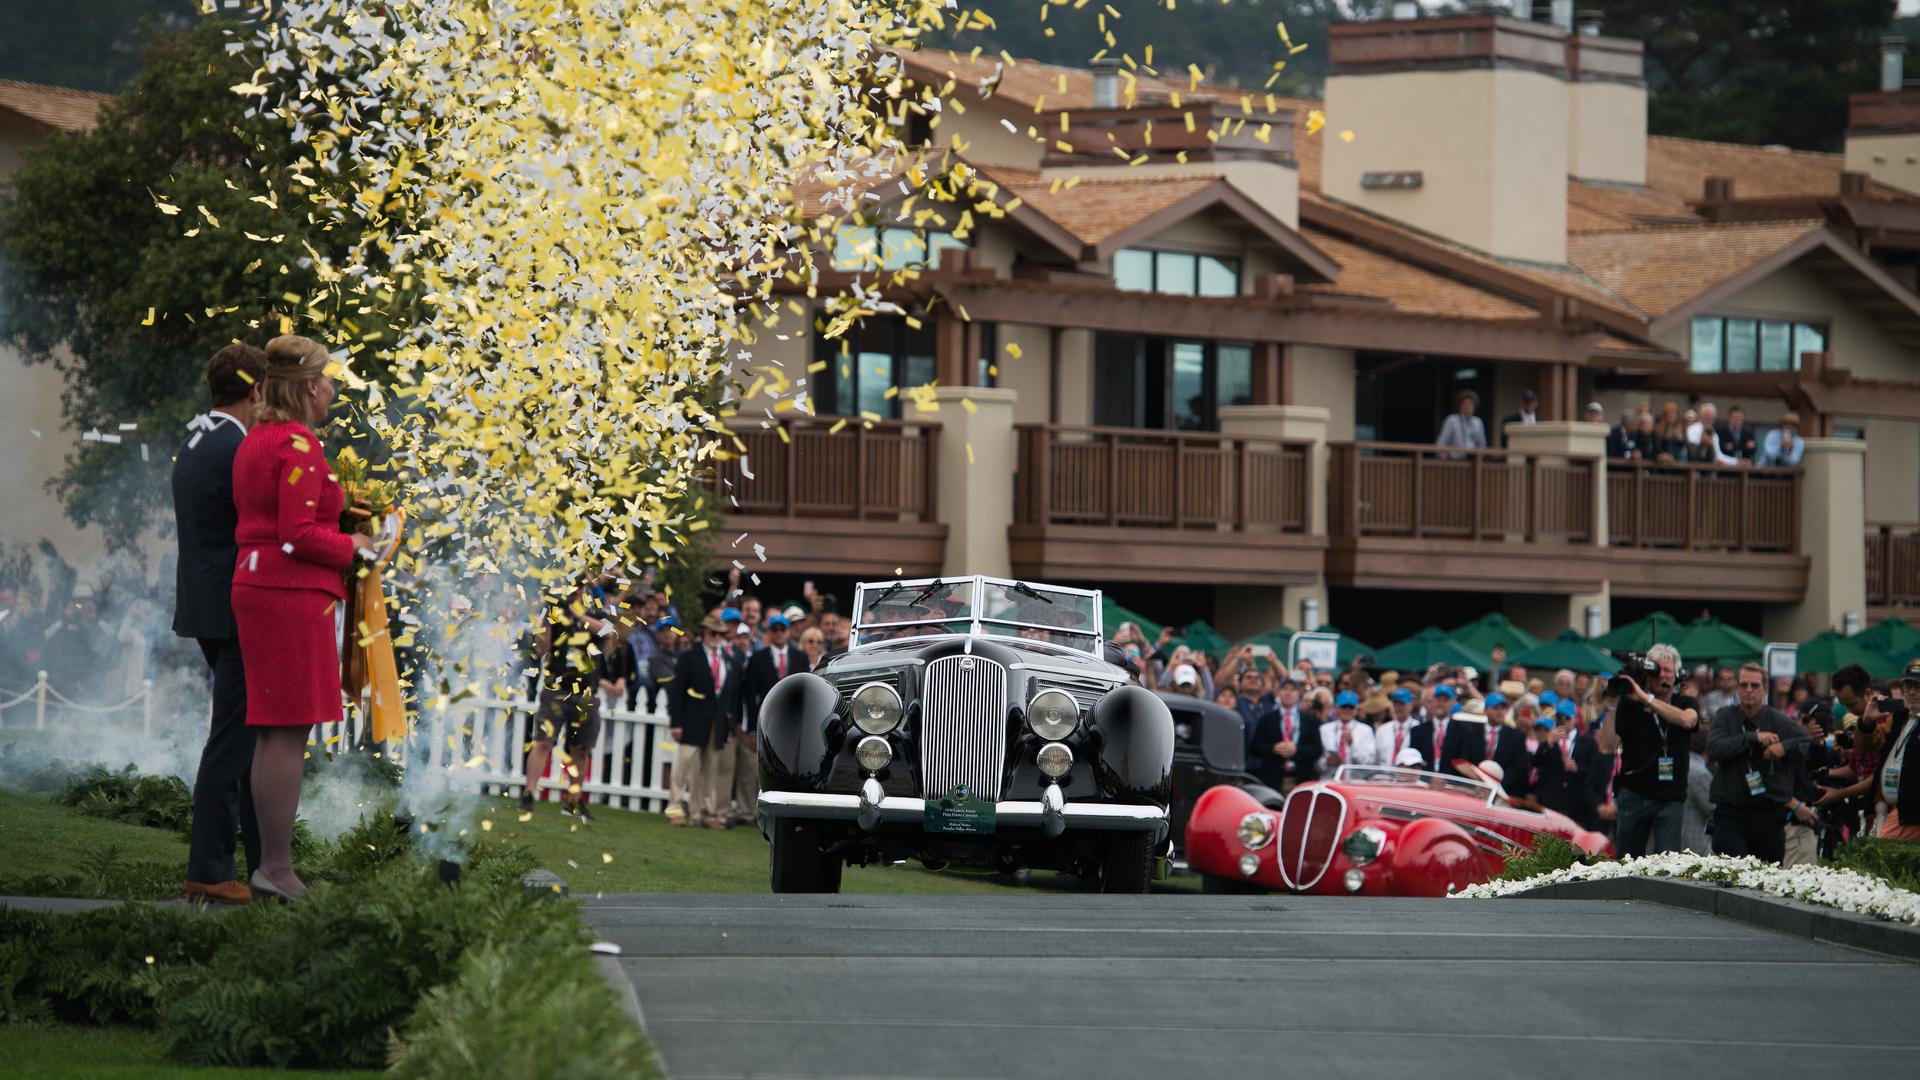 1936 Lancia Astura Pininfarina Cabriolet named Best In Show at Pebble Beach